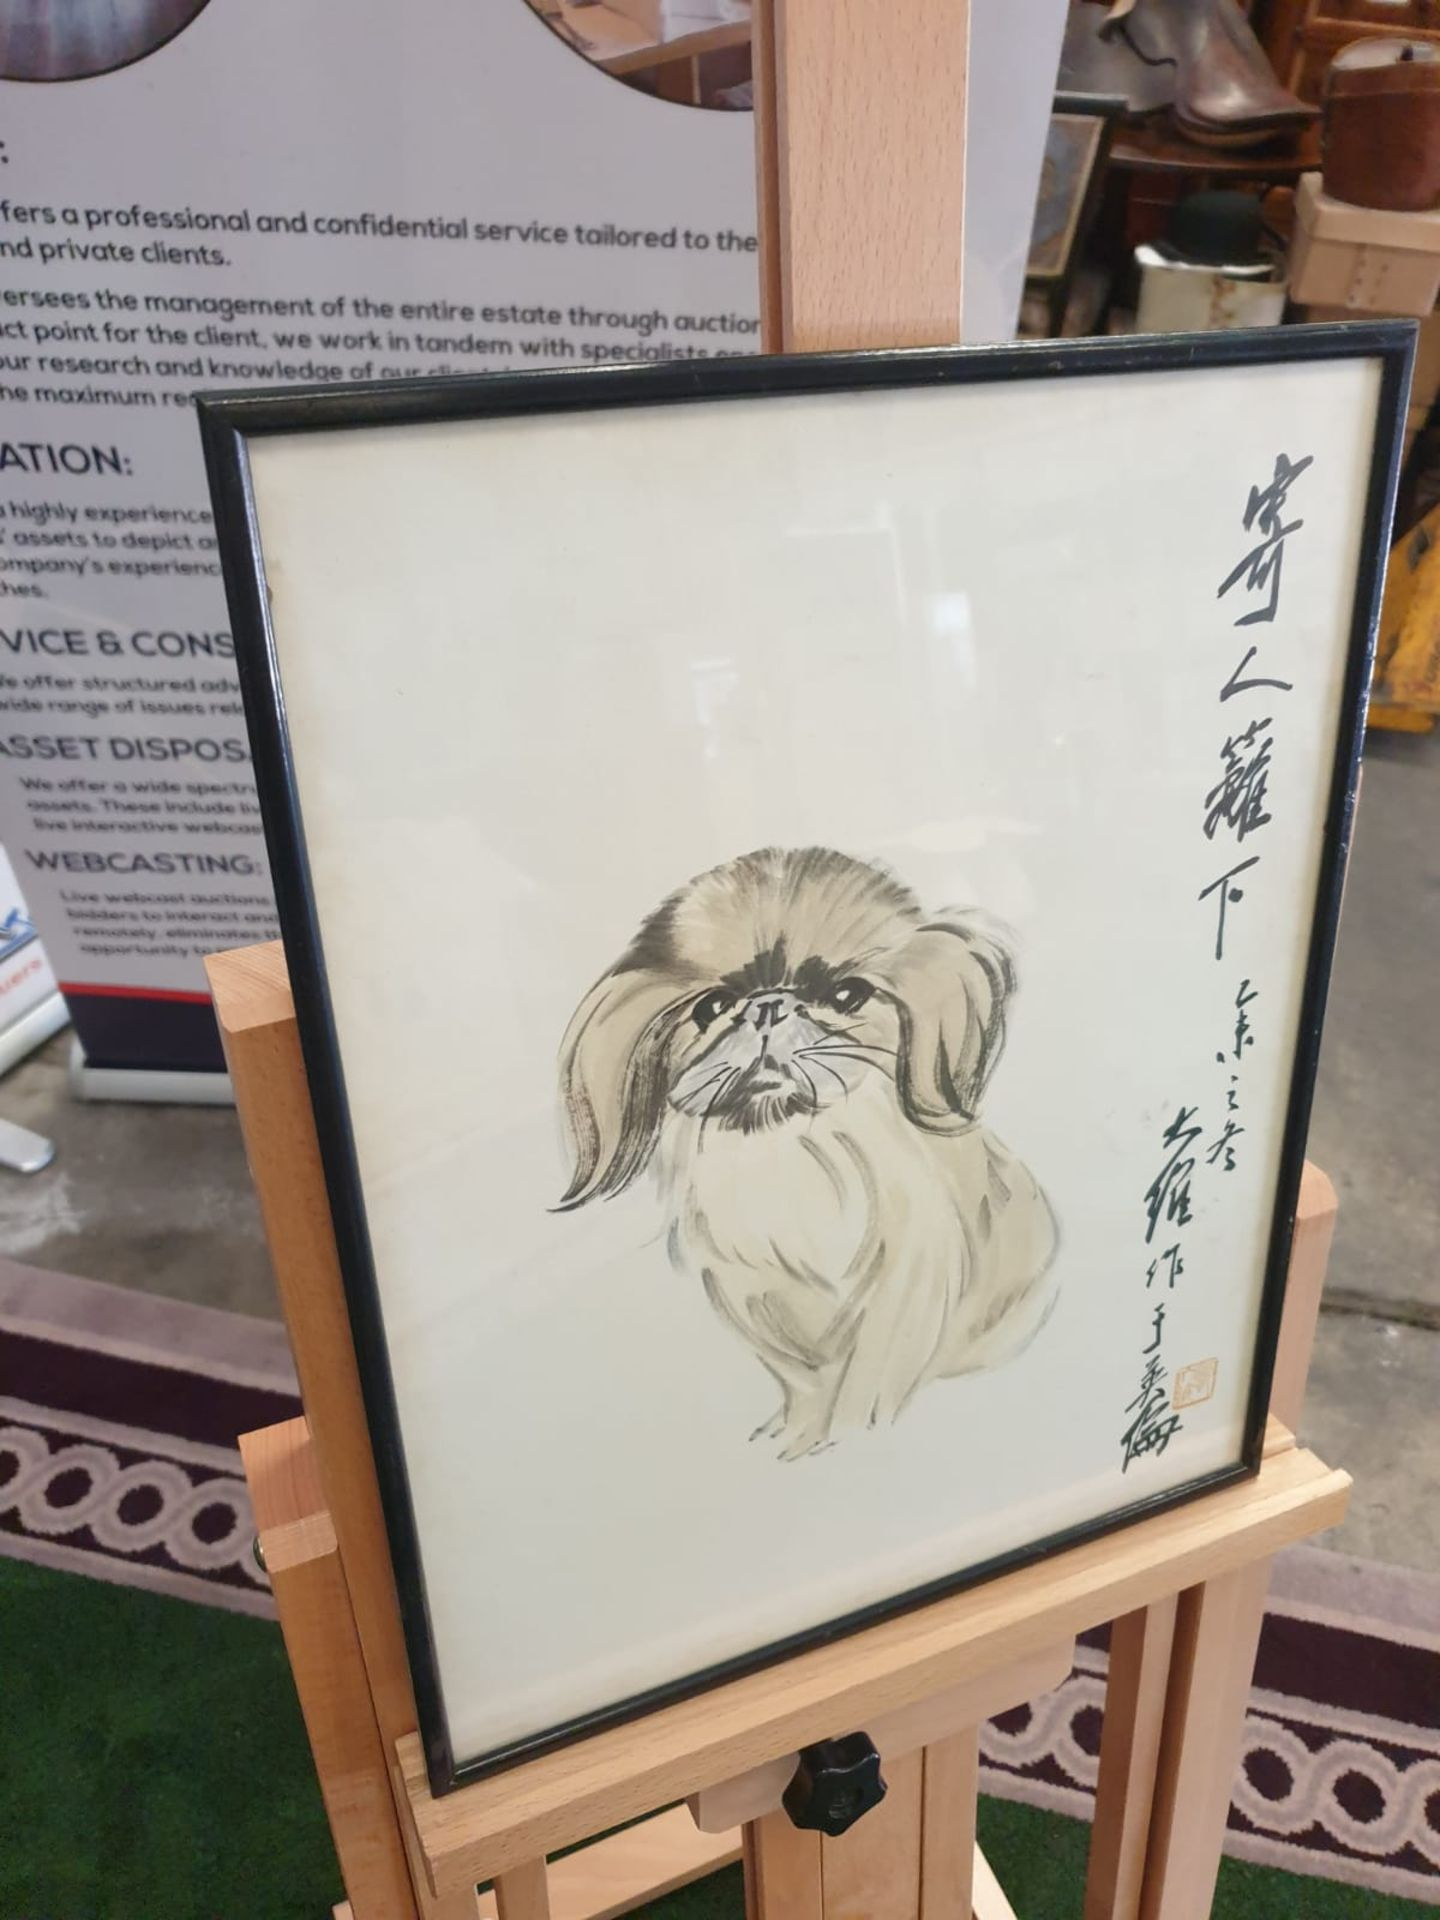 David Kwo Da-Wei (1919-2003) Chinese Lithographic Print Pup Da Wei Kwo, David Kwo 1919-2003 (Dawei - Image 2 of 3